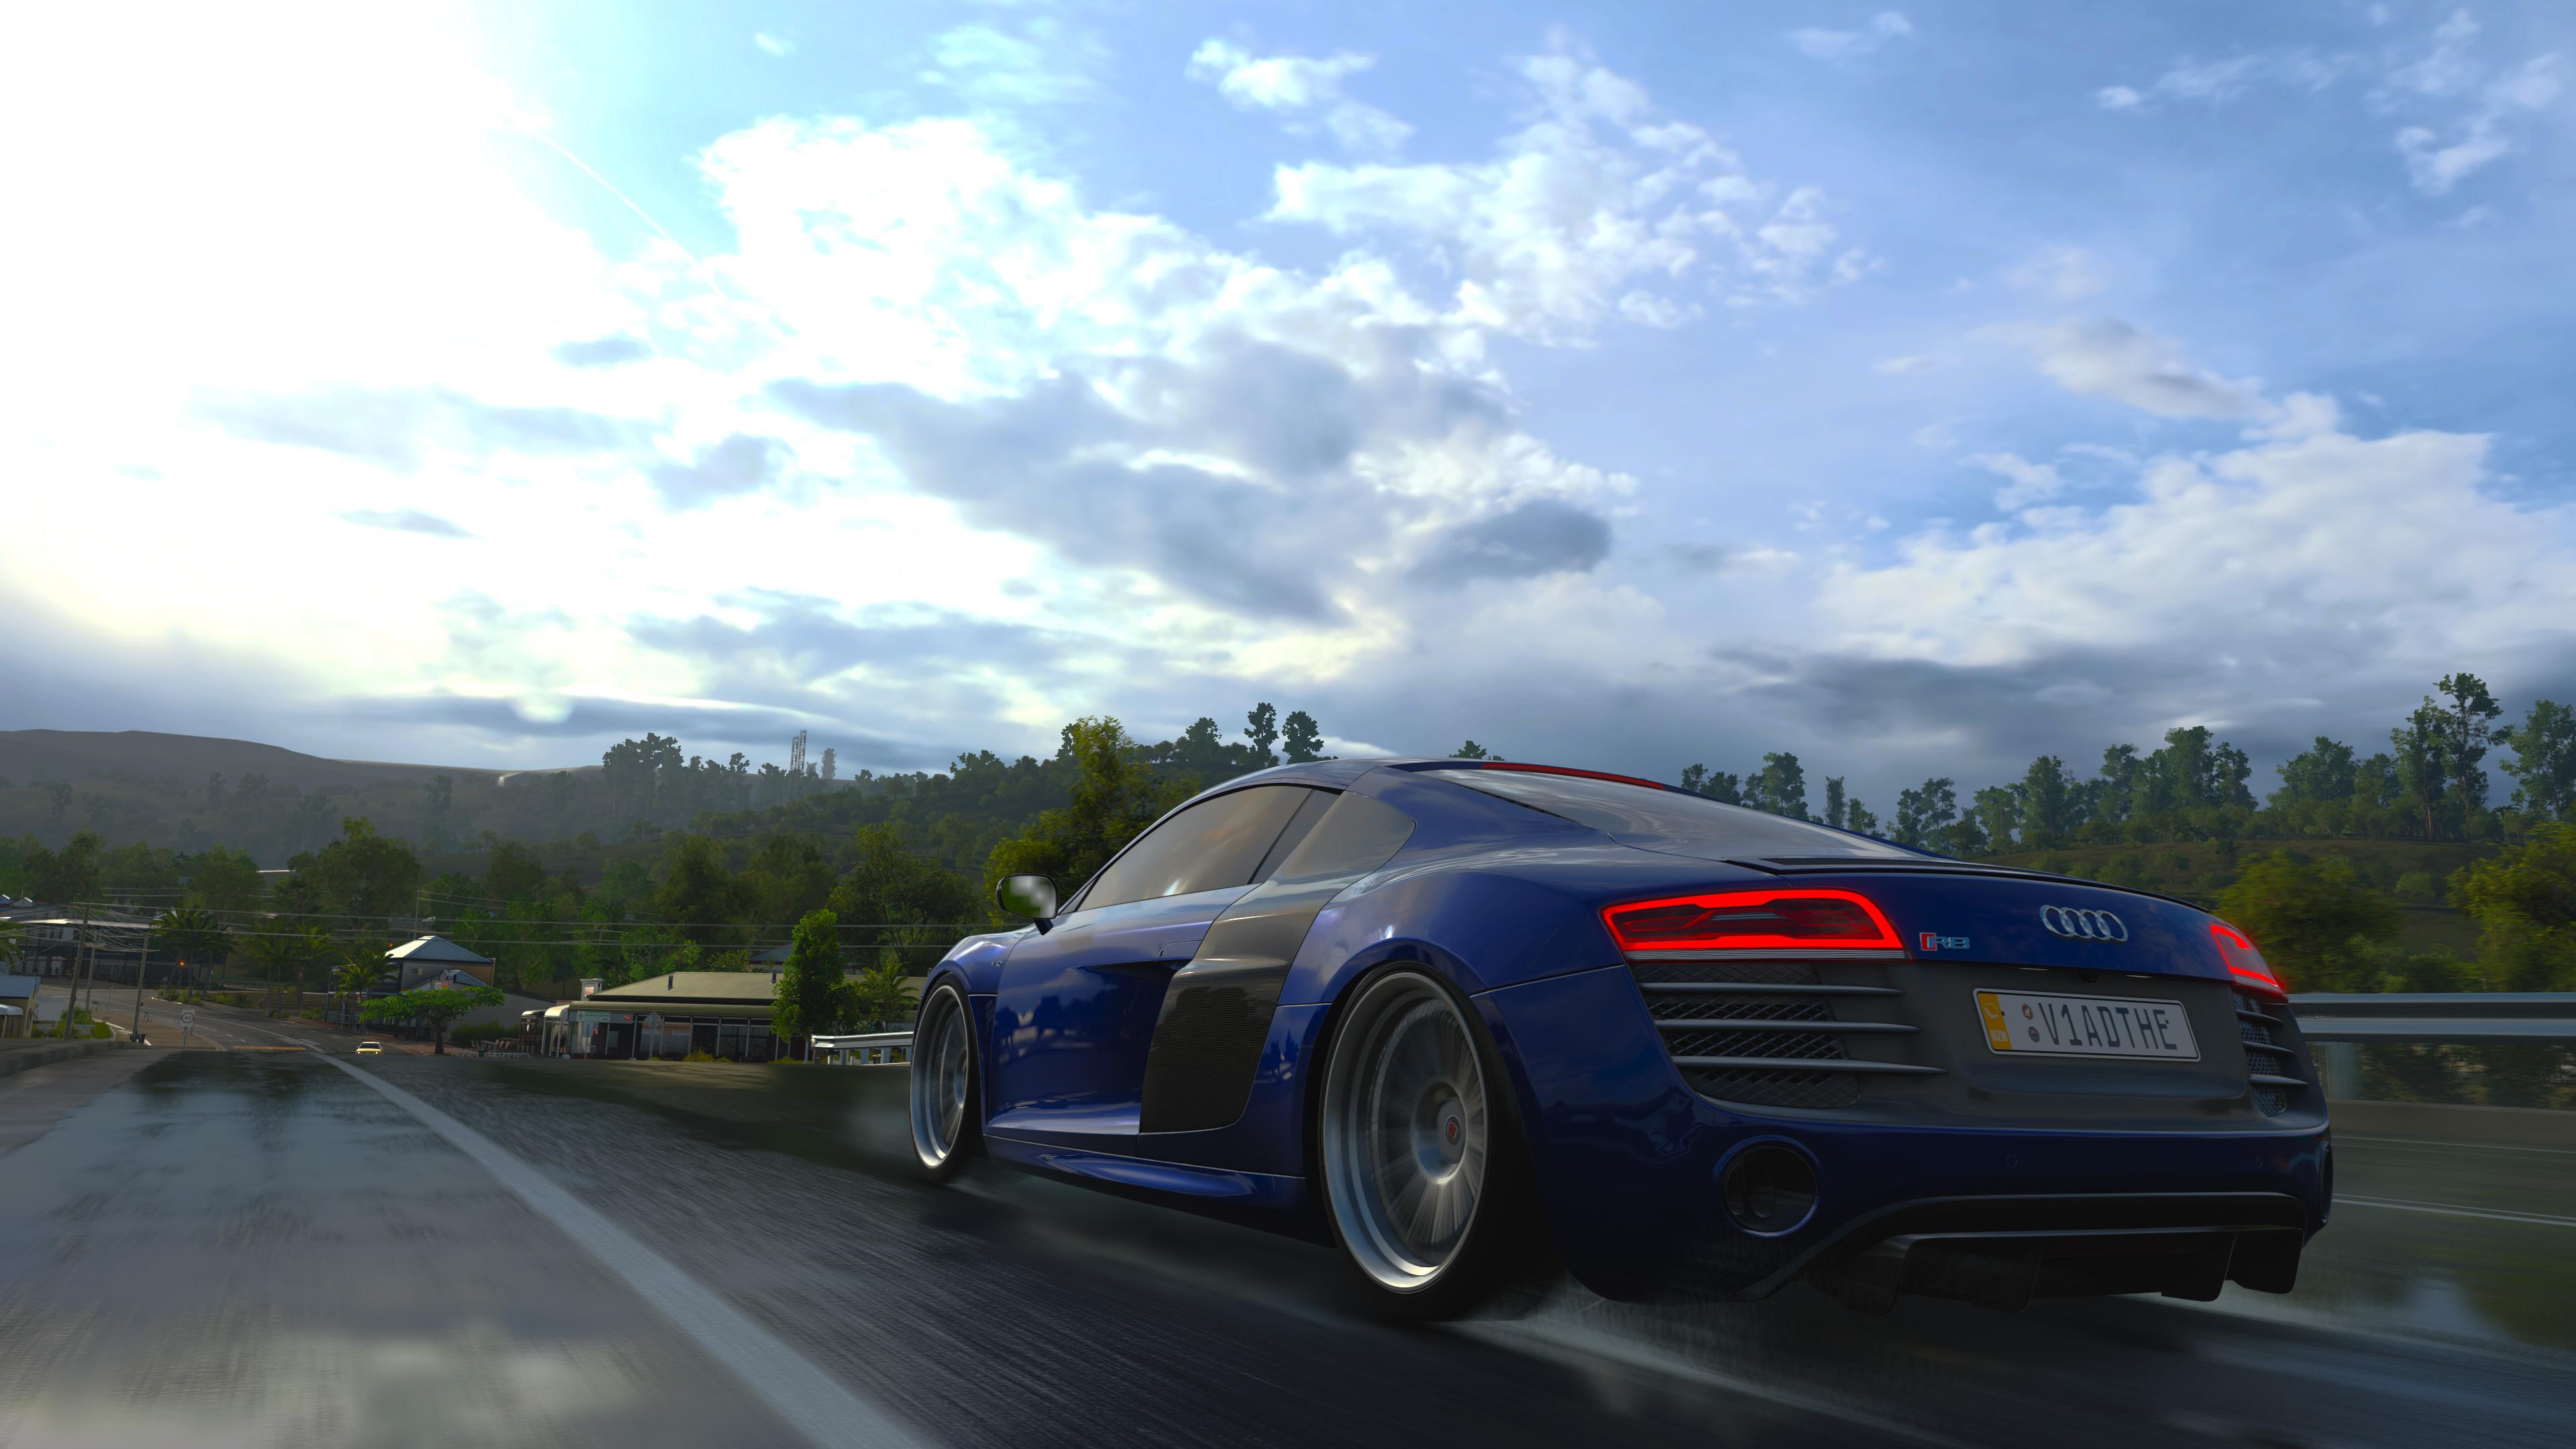 Forza Horizon 3 Background: 1920x1080 Audi R8 Forza Horizon 3 Laptop Full HD 1080P HD